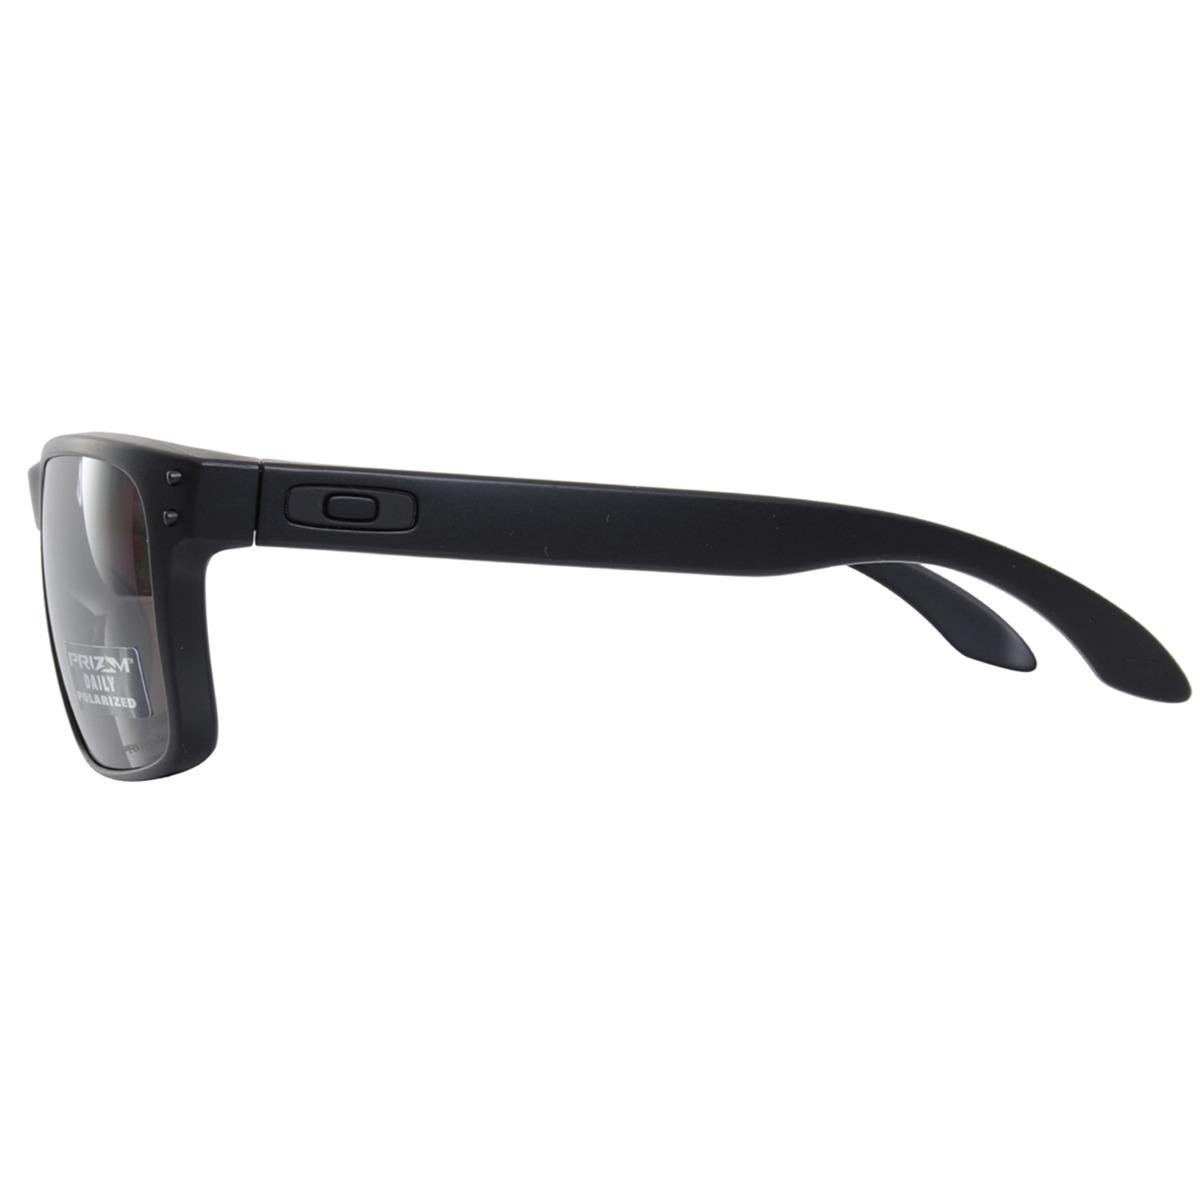 aa67db5feda53 Óculos Oakley Holbrook Covert Matte Prizm - R  630,00 em Mercado Livre